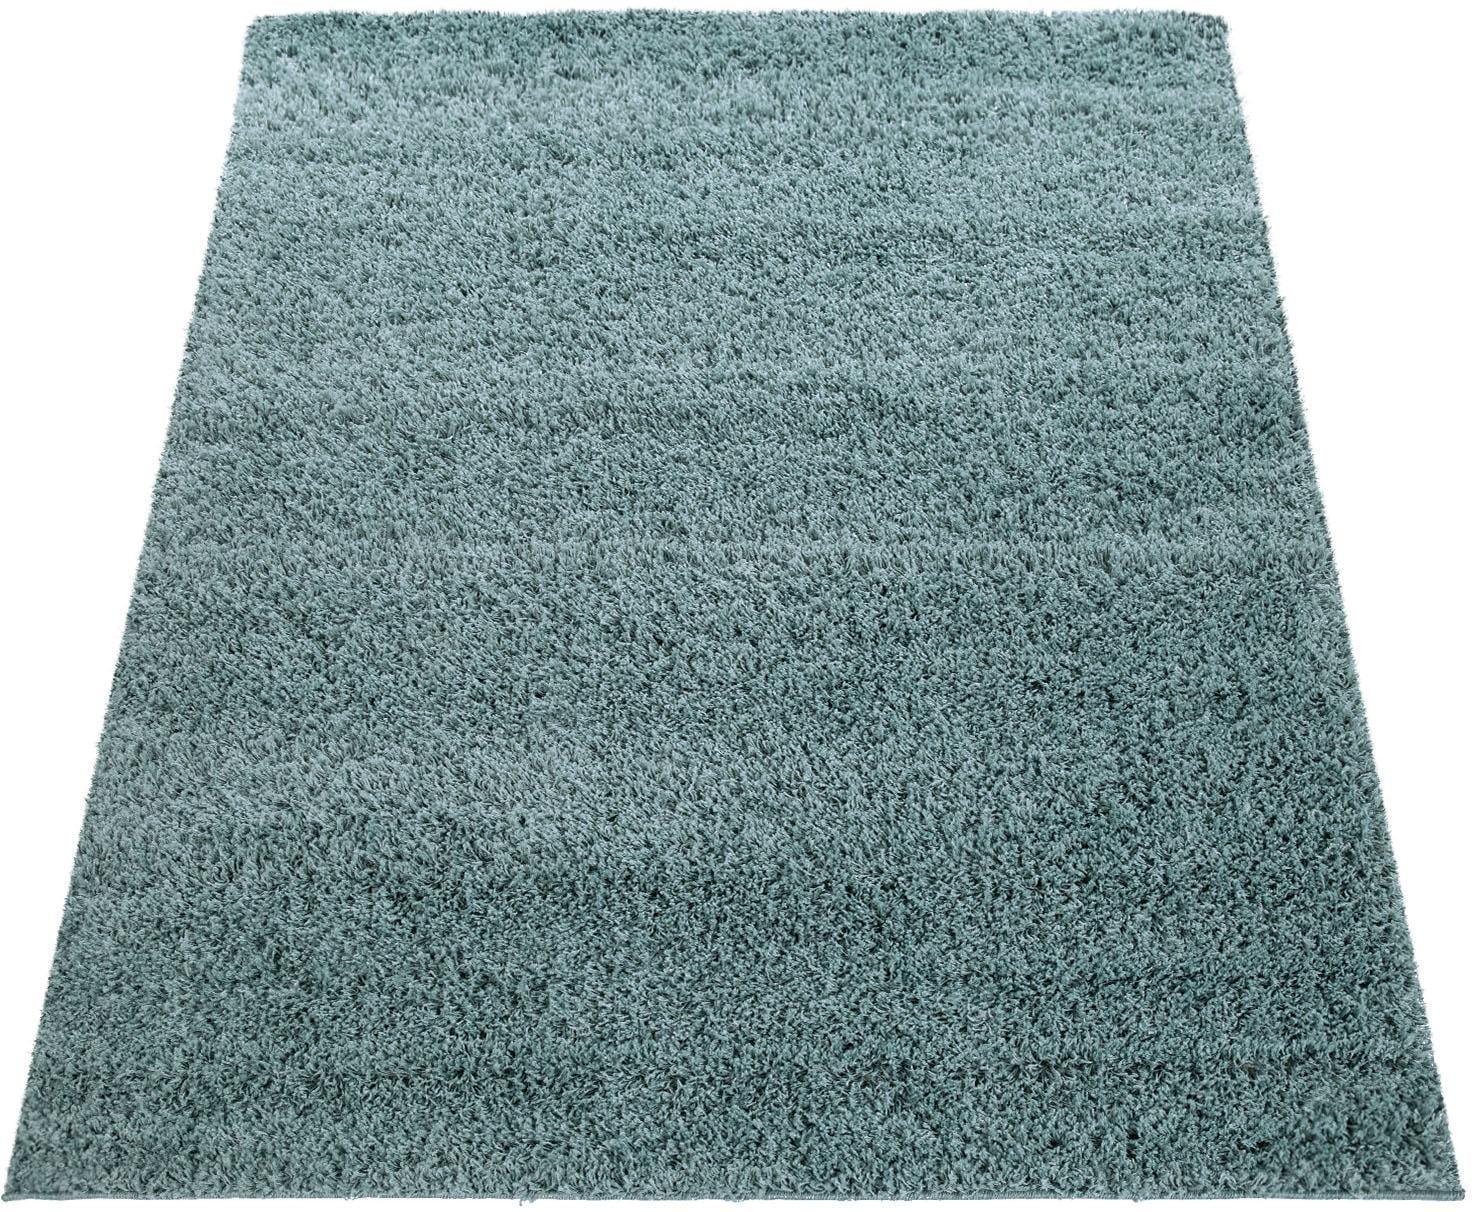 Teppich Twister 500 Paco Home rechteckig Höhe 45 mm